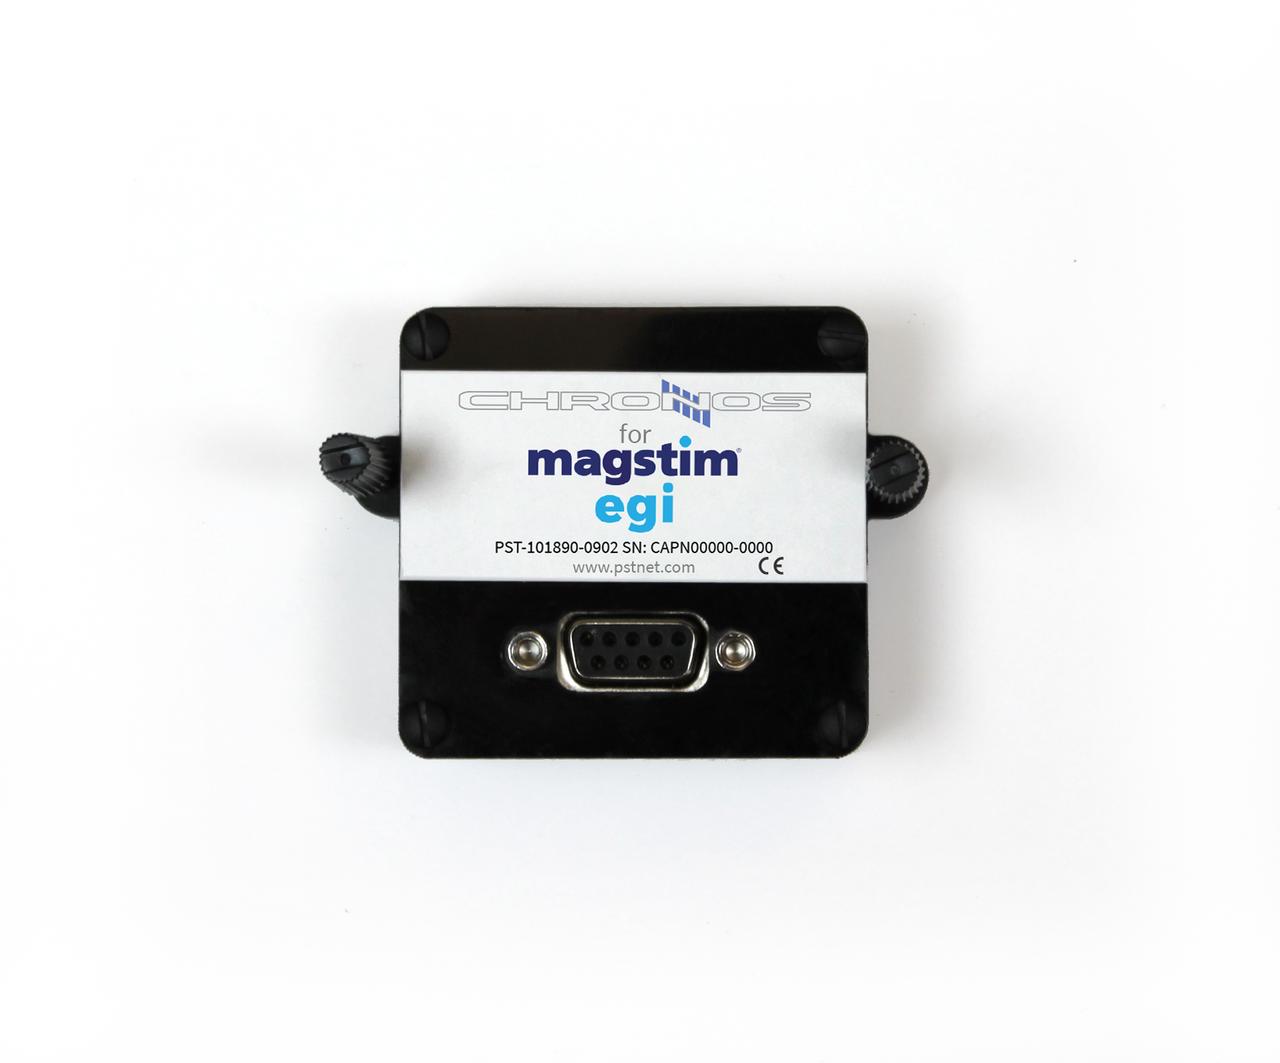 Chronos Adapter for Magstim EGI EEG